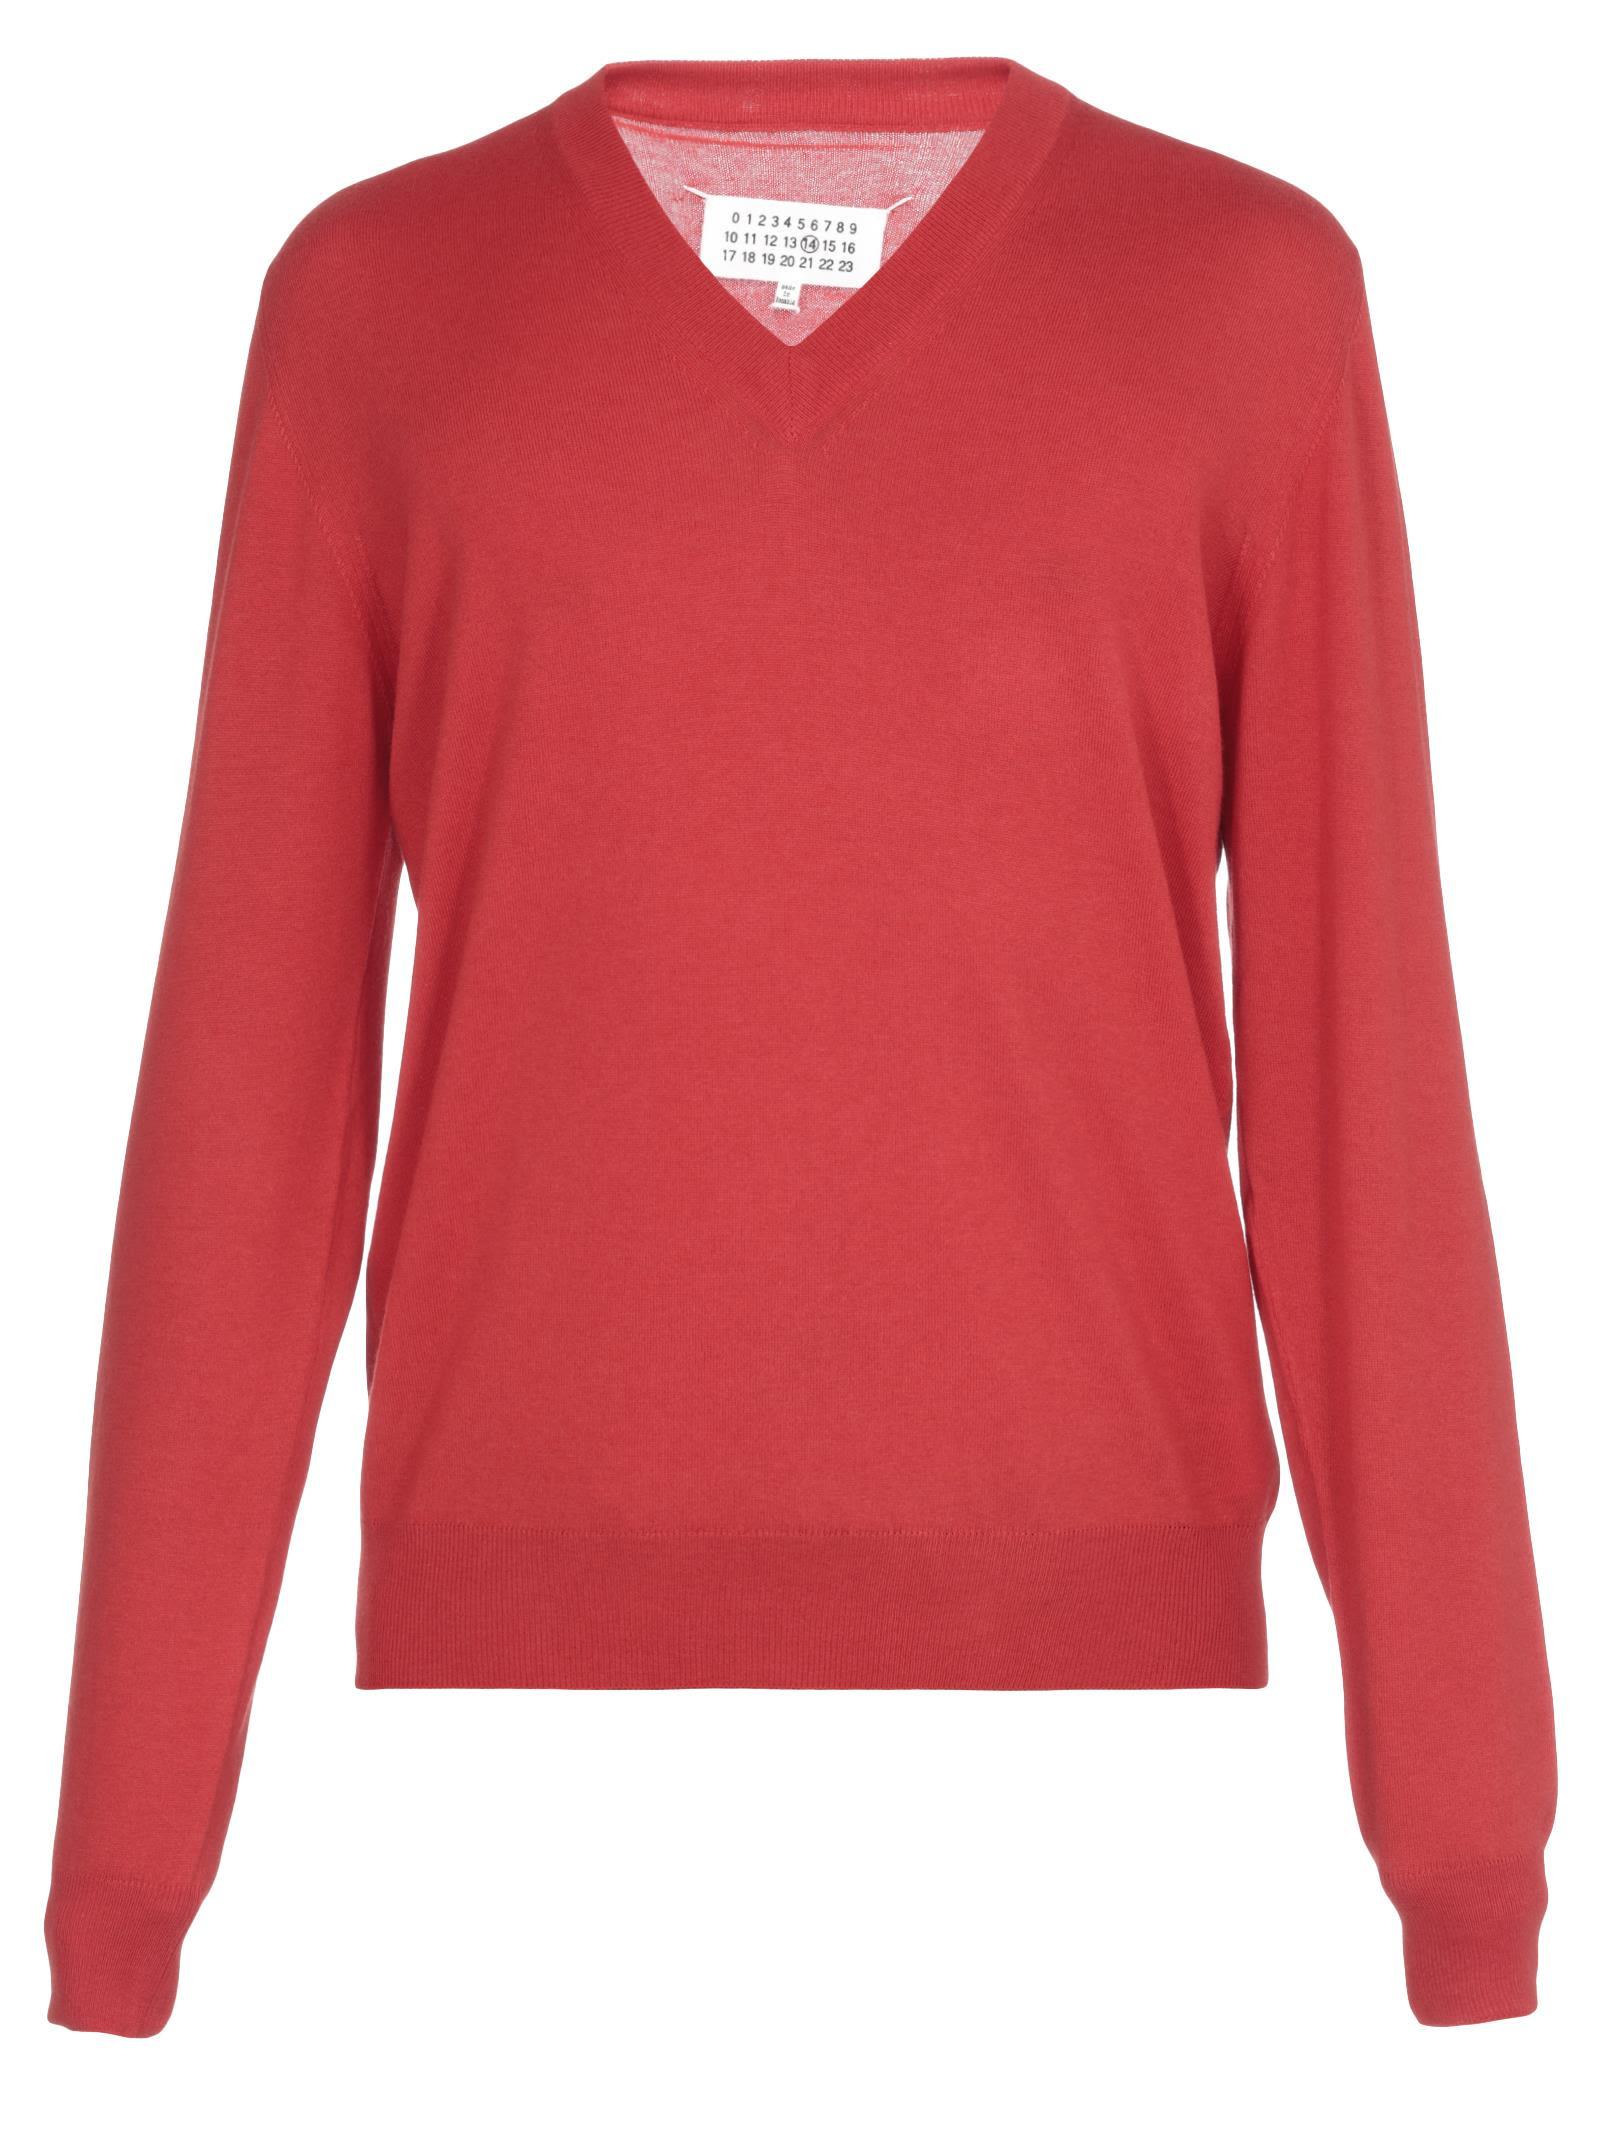 Maison Margiela Cotton And Wool Sweater